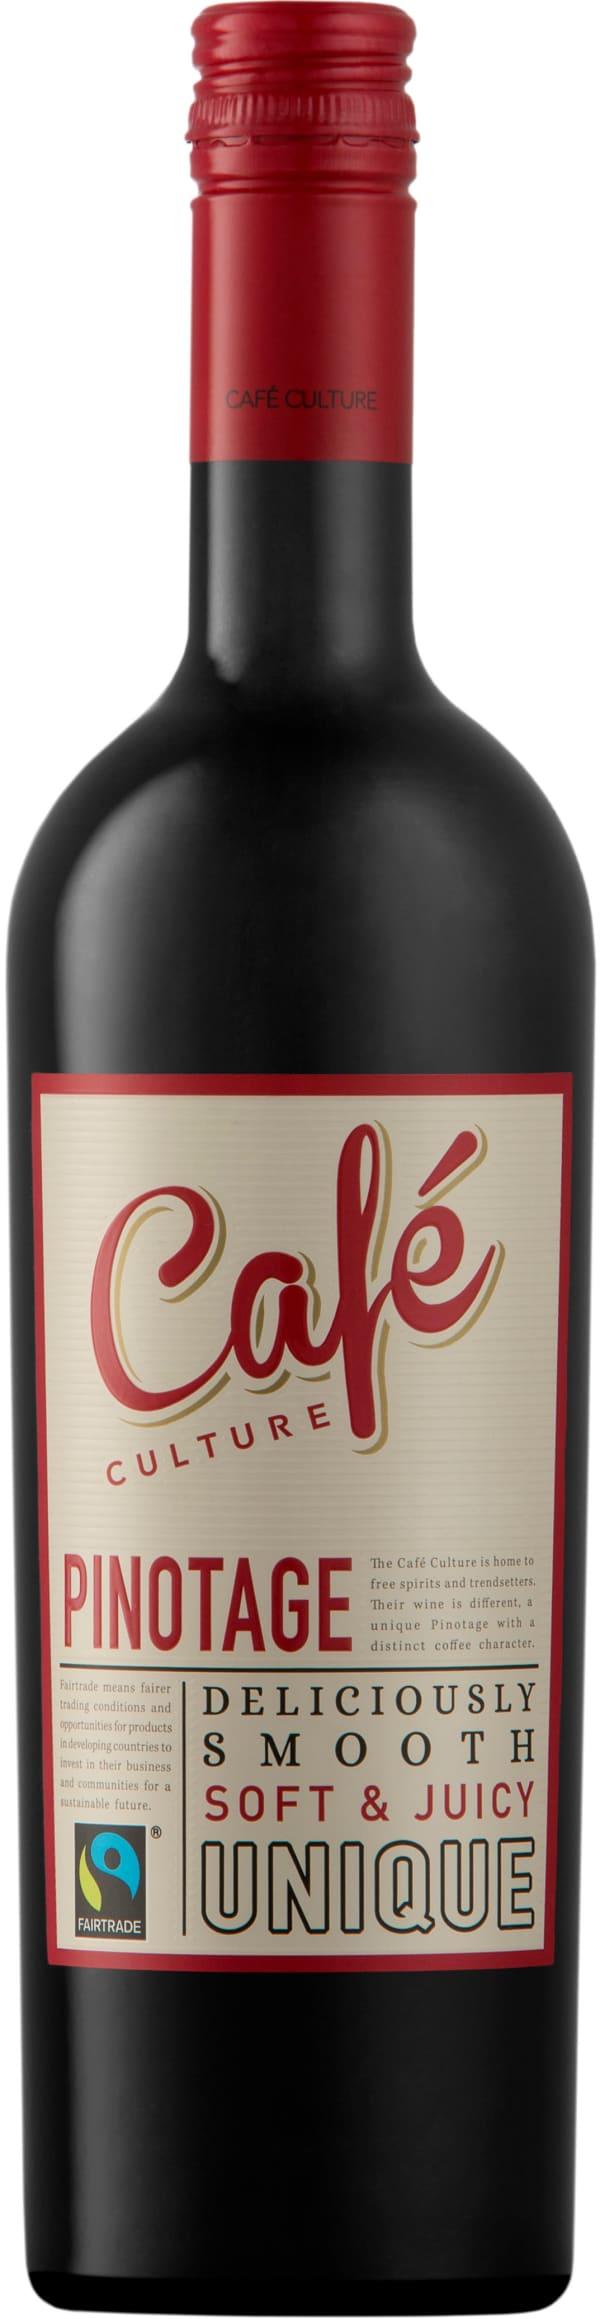 Café Culture Pinotage 2018